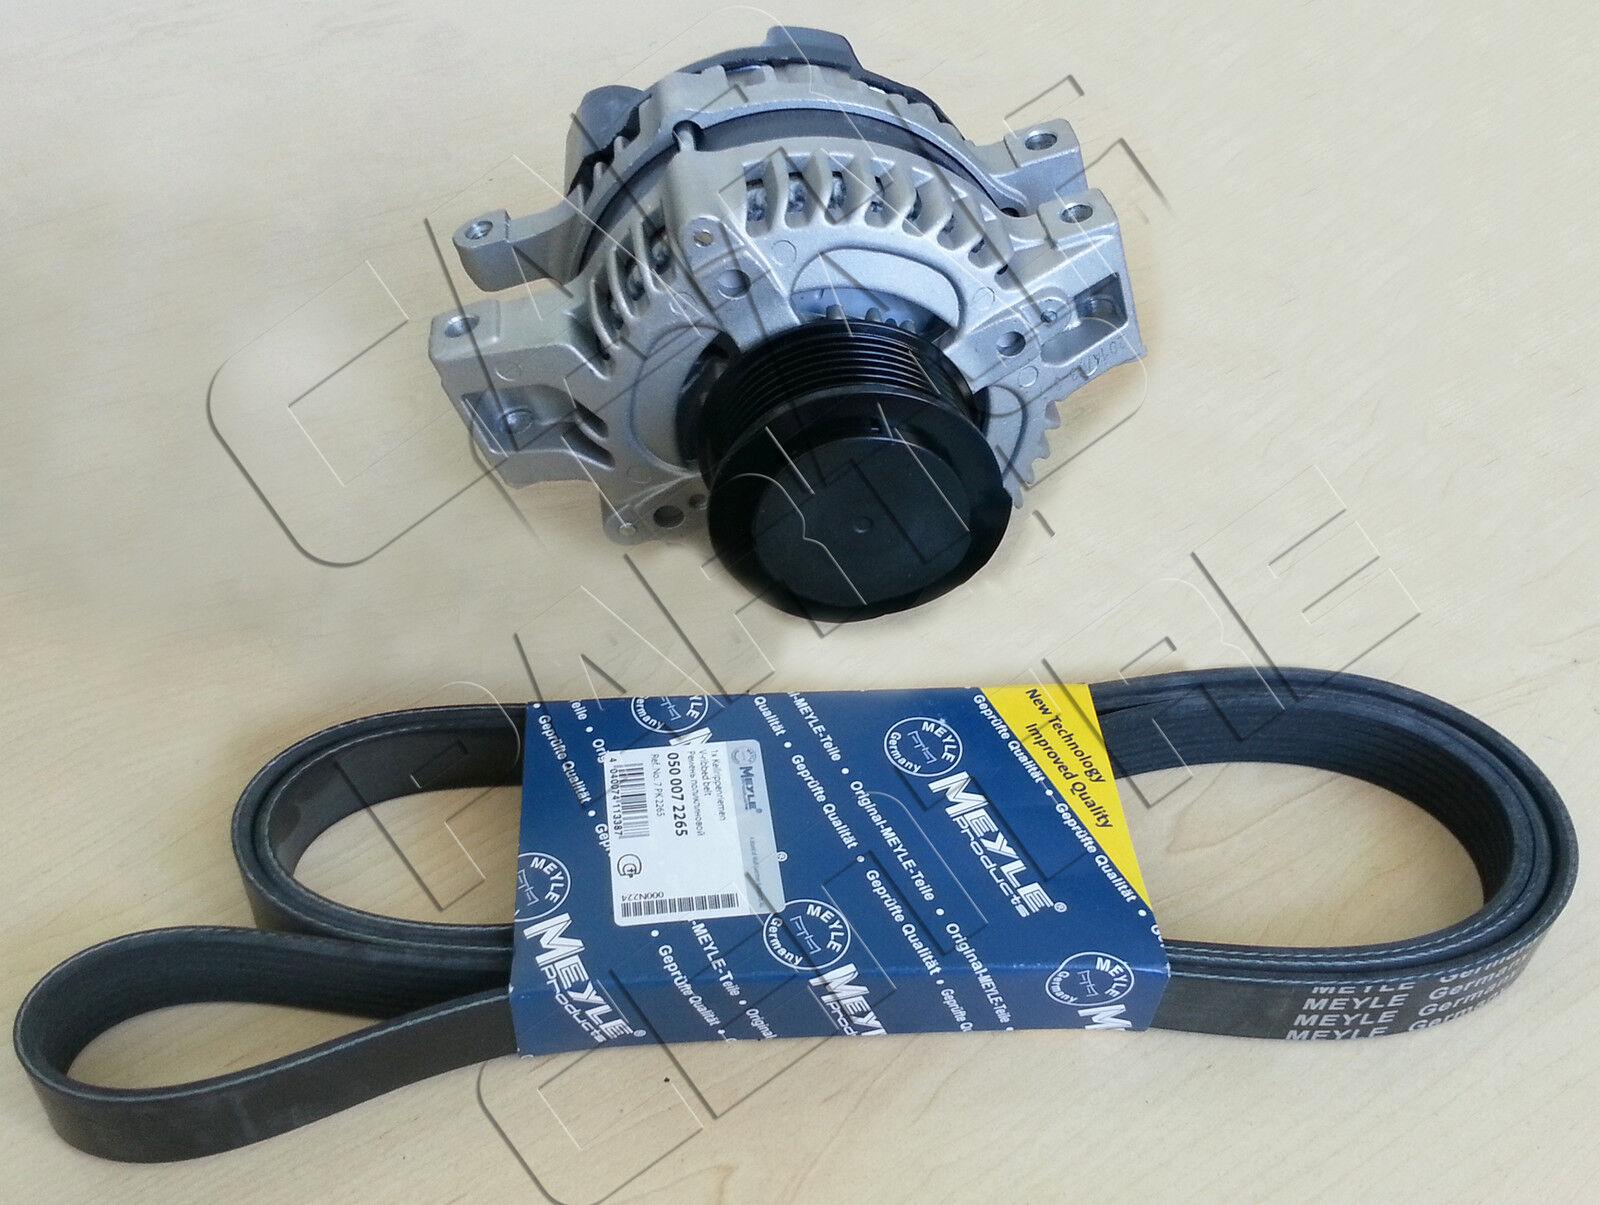 For Honda Accord Crv Frv Civic 22 Diesel Ctdi Alternator Meyle Epdm 2004 Wiring Fan Belt